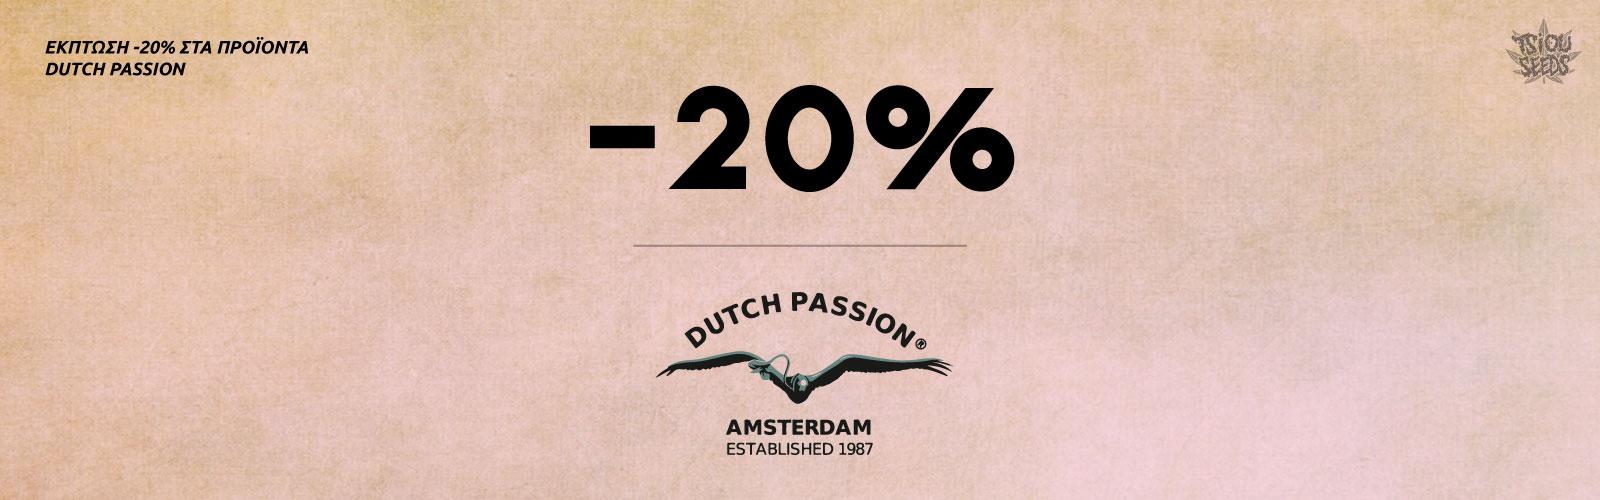 Dutch-Passion-Offer